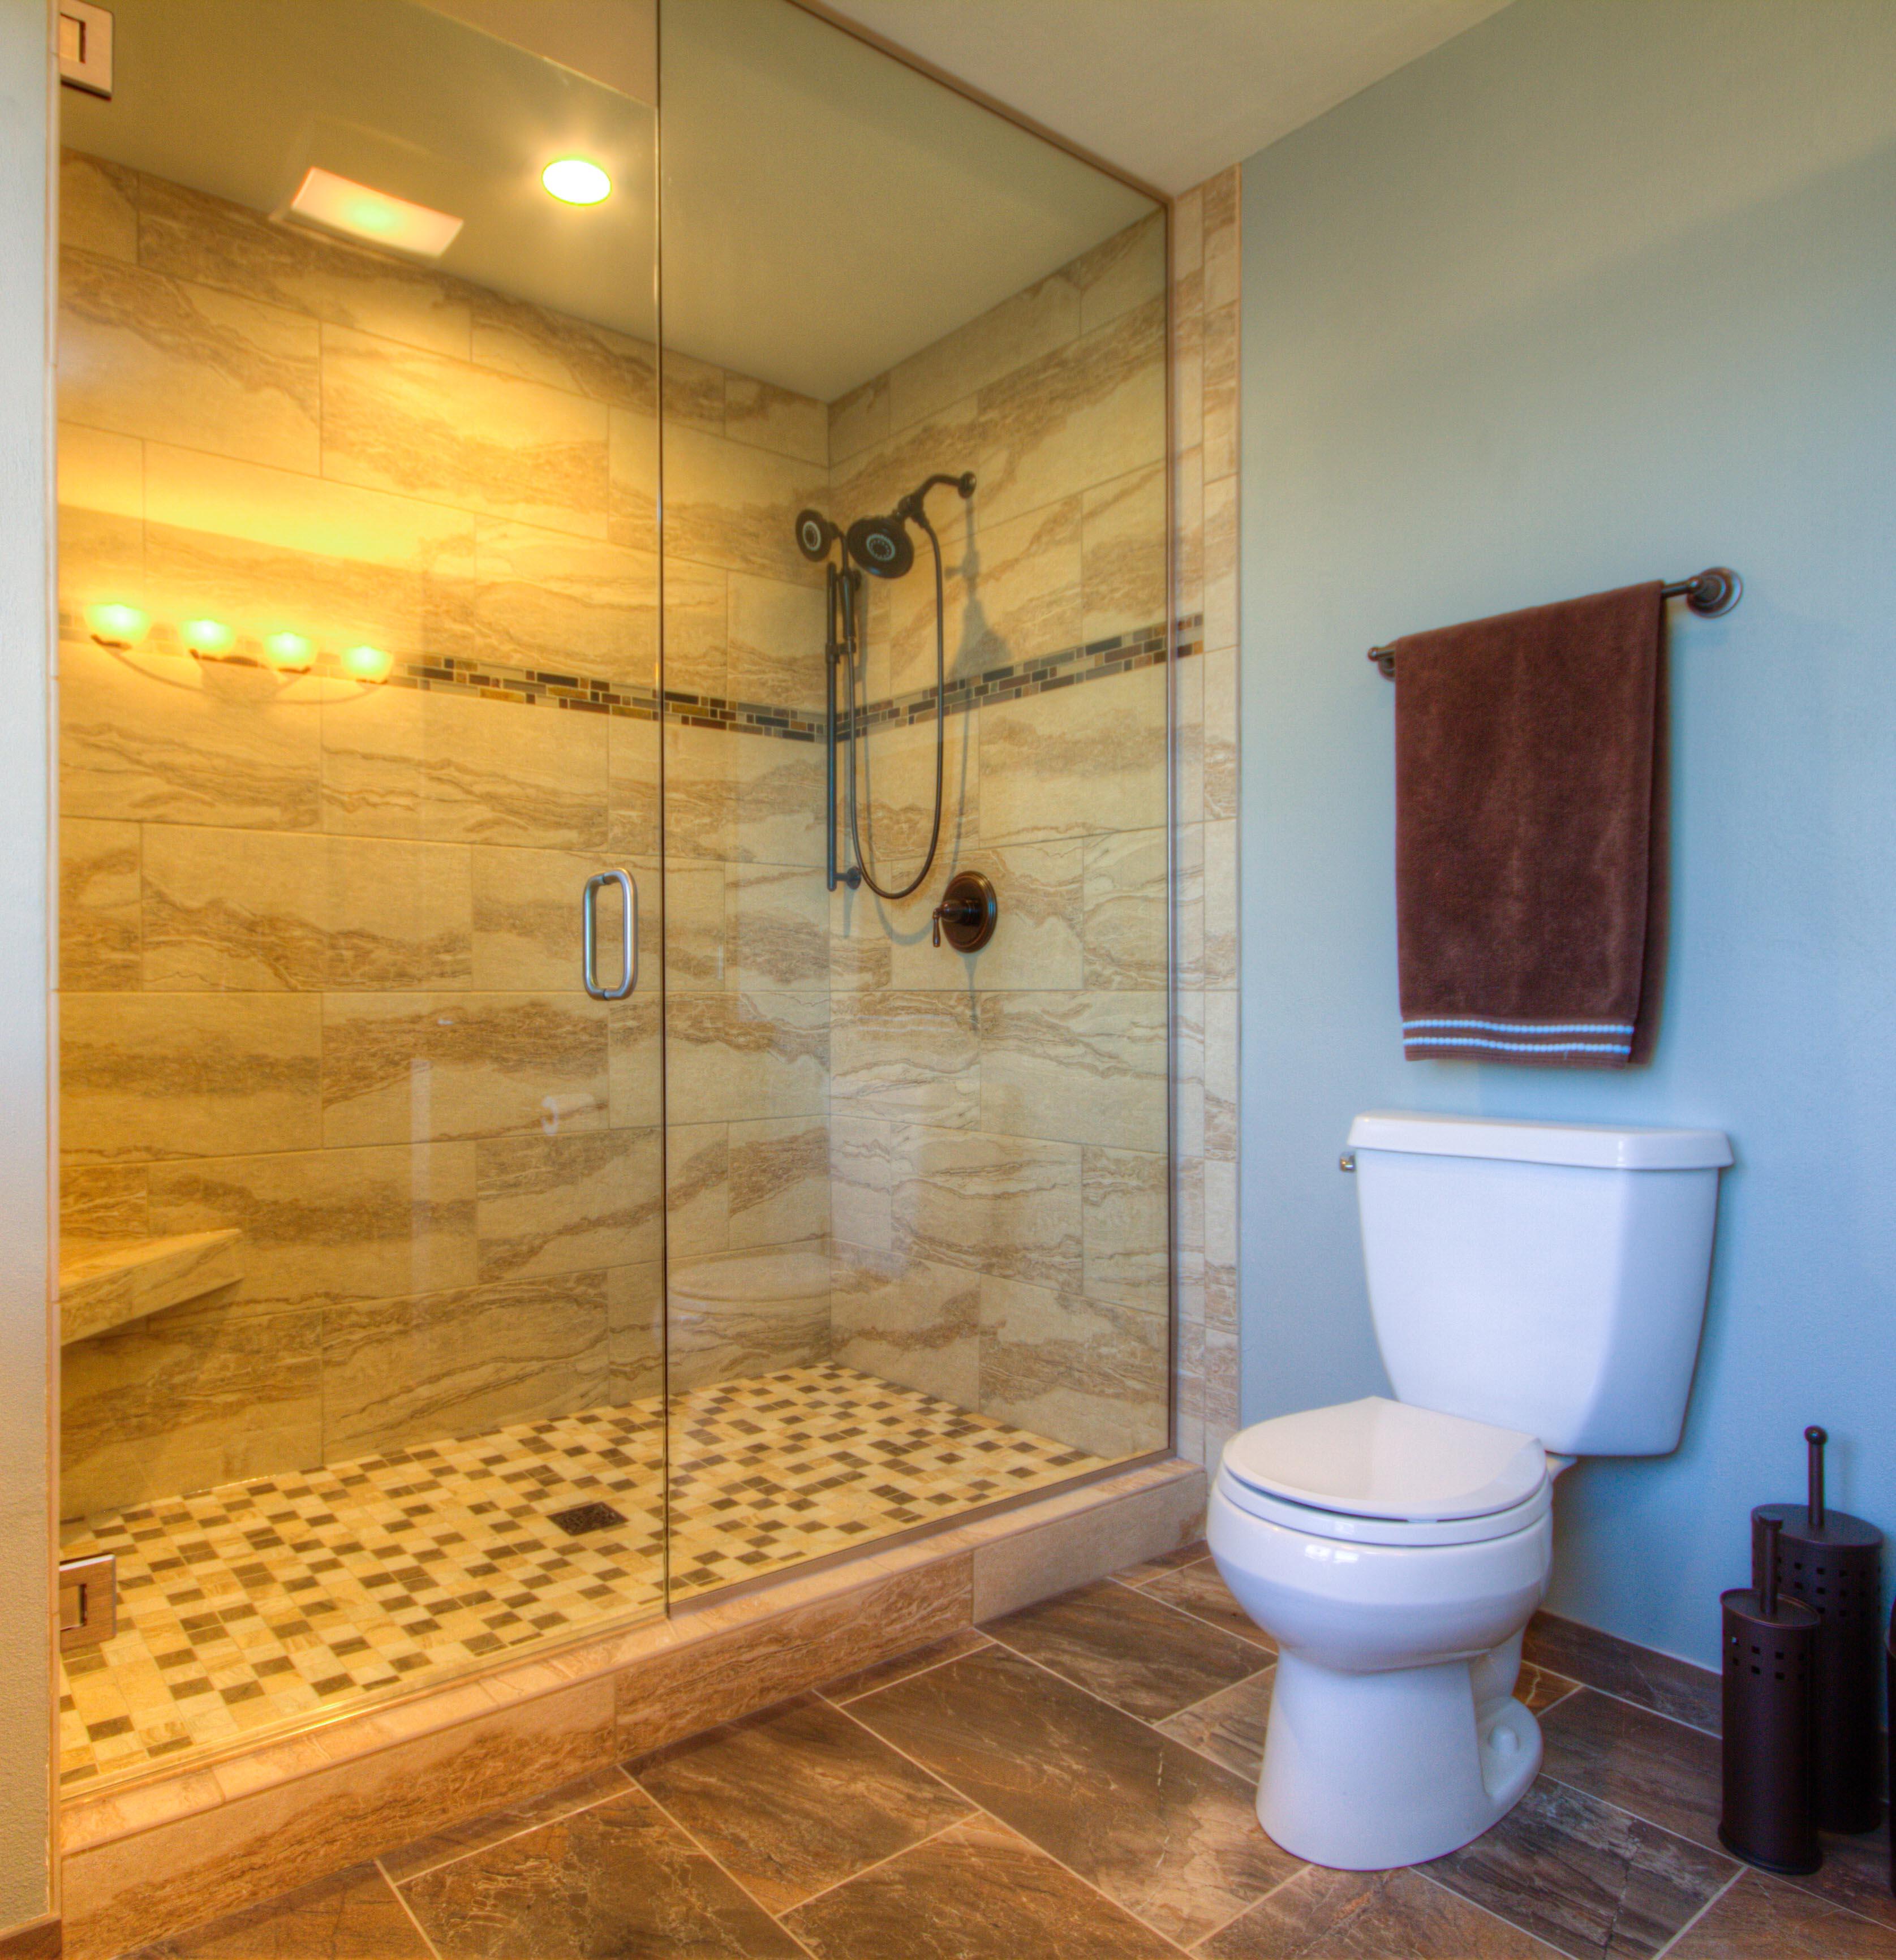 Bathroom Design, custom shower with a curb, frameless glass shower surround, dark brown bathroom floor, light beige shower tile